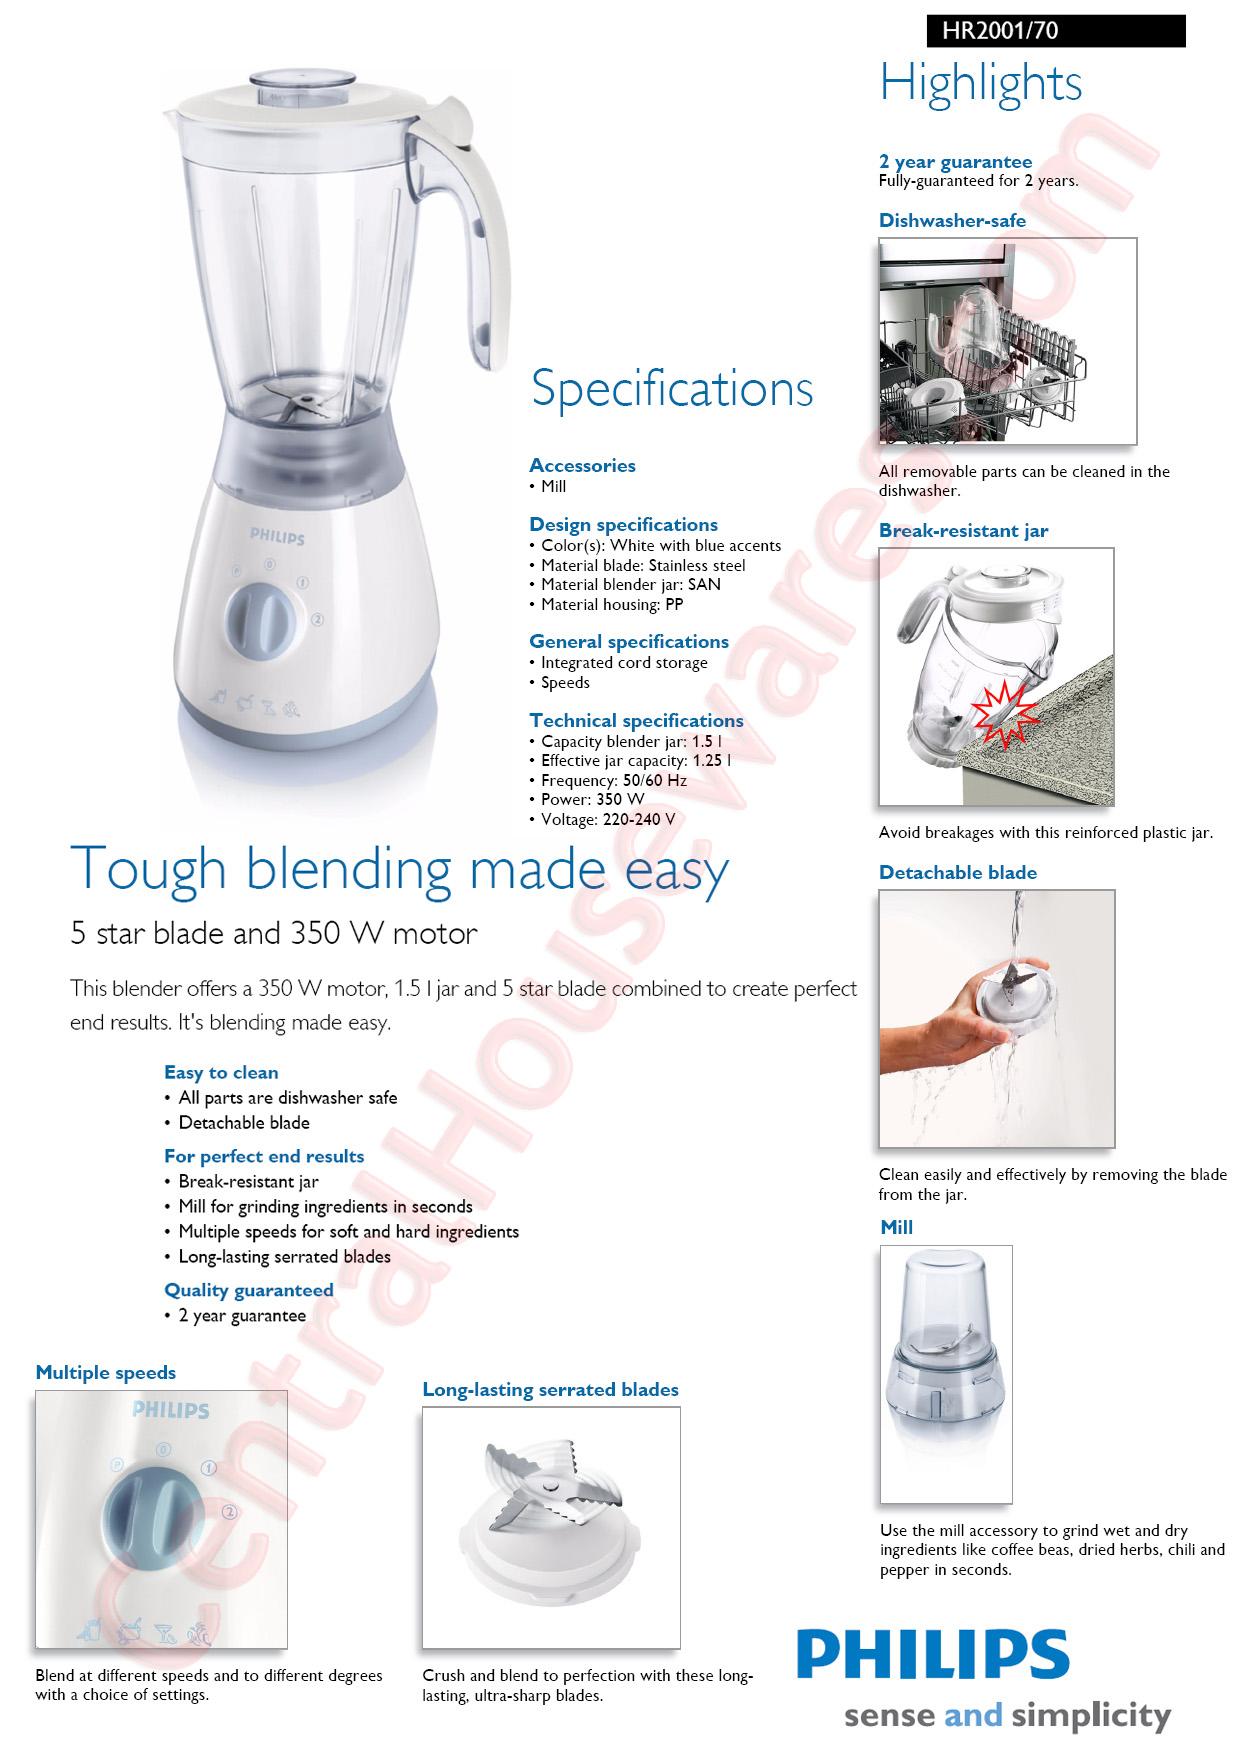 Philips Home Appliances